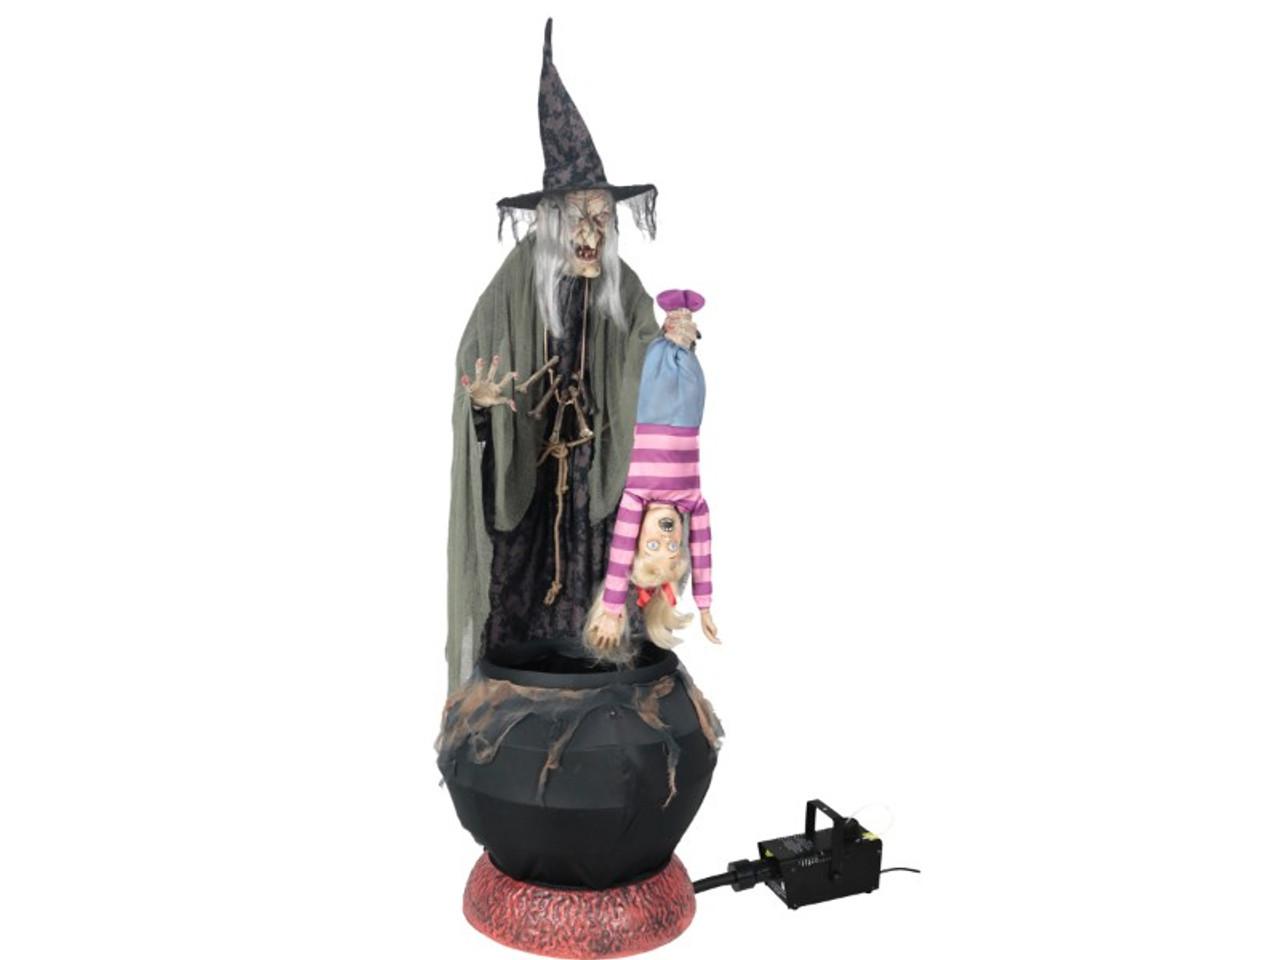 Brewing Witch Cauldron Child Animated Houseofhauntz Com